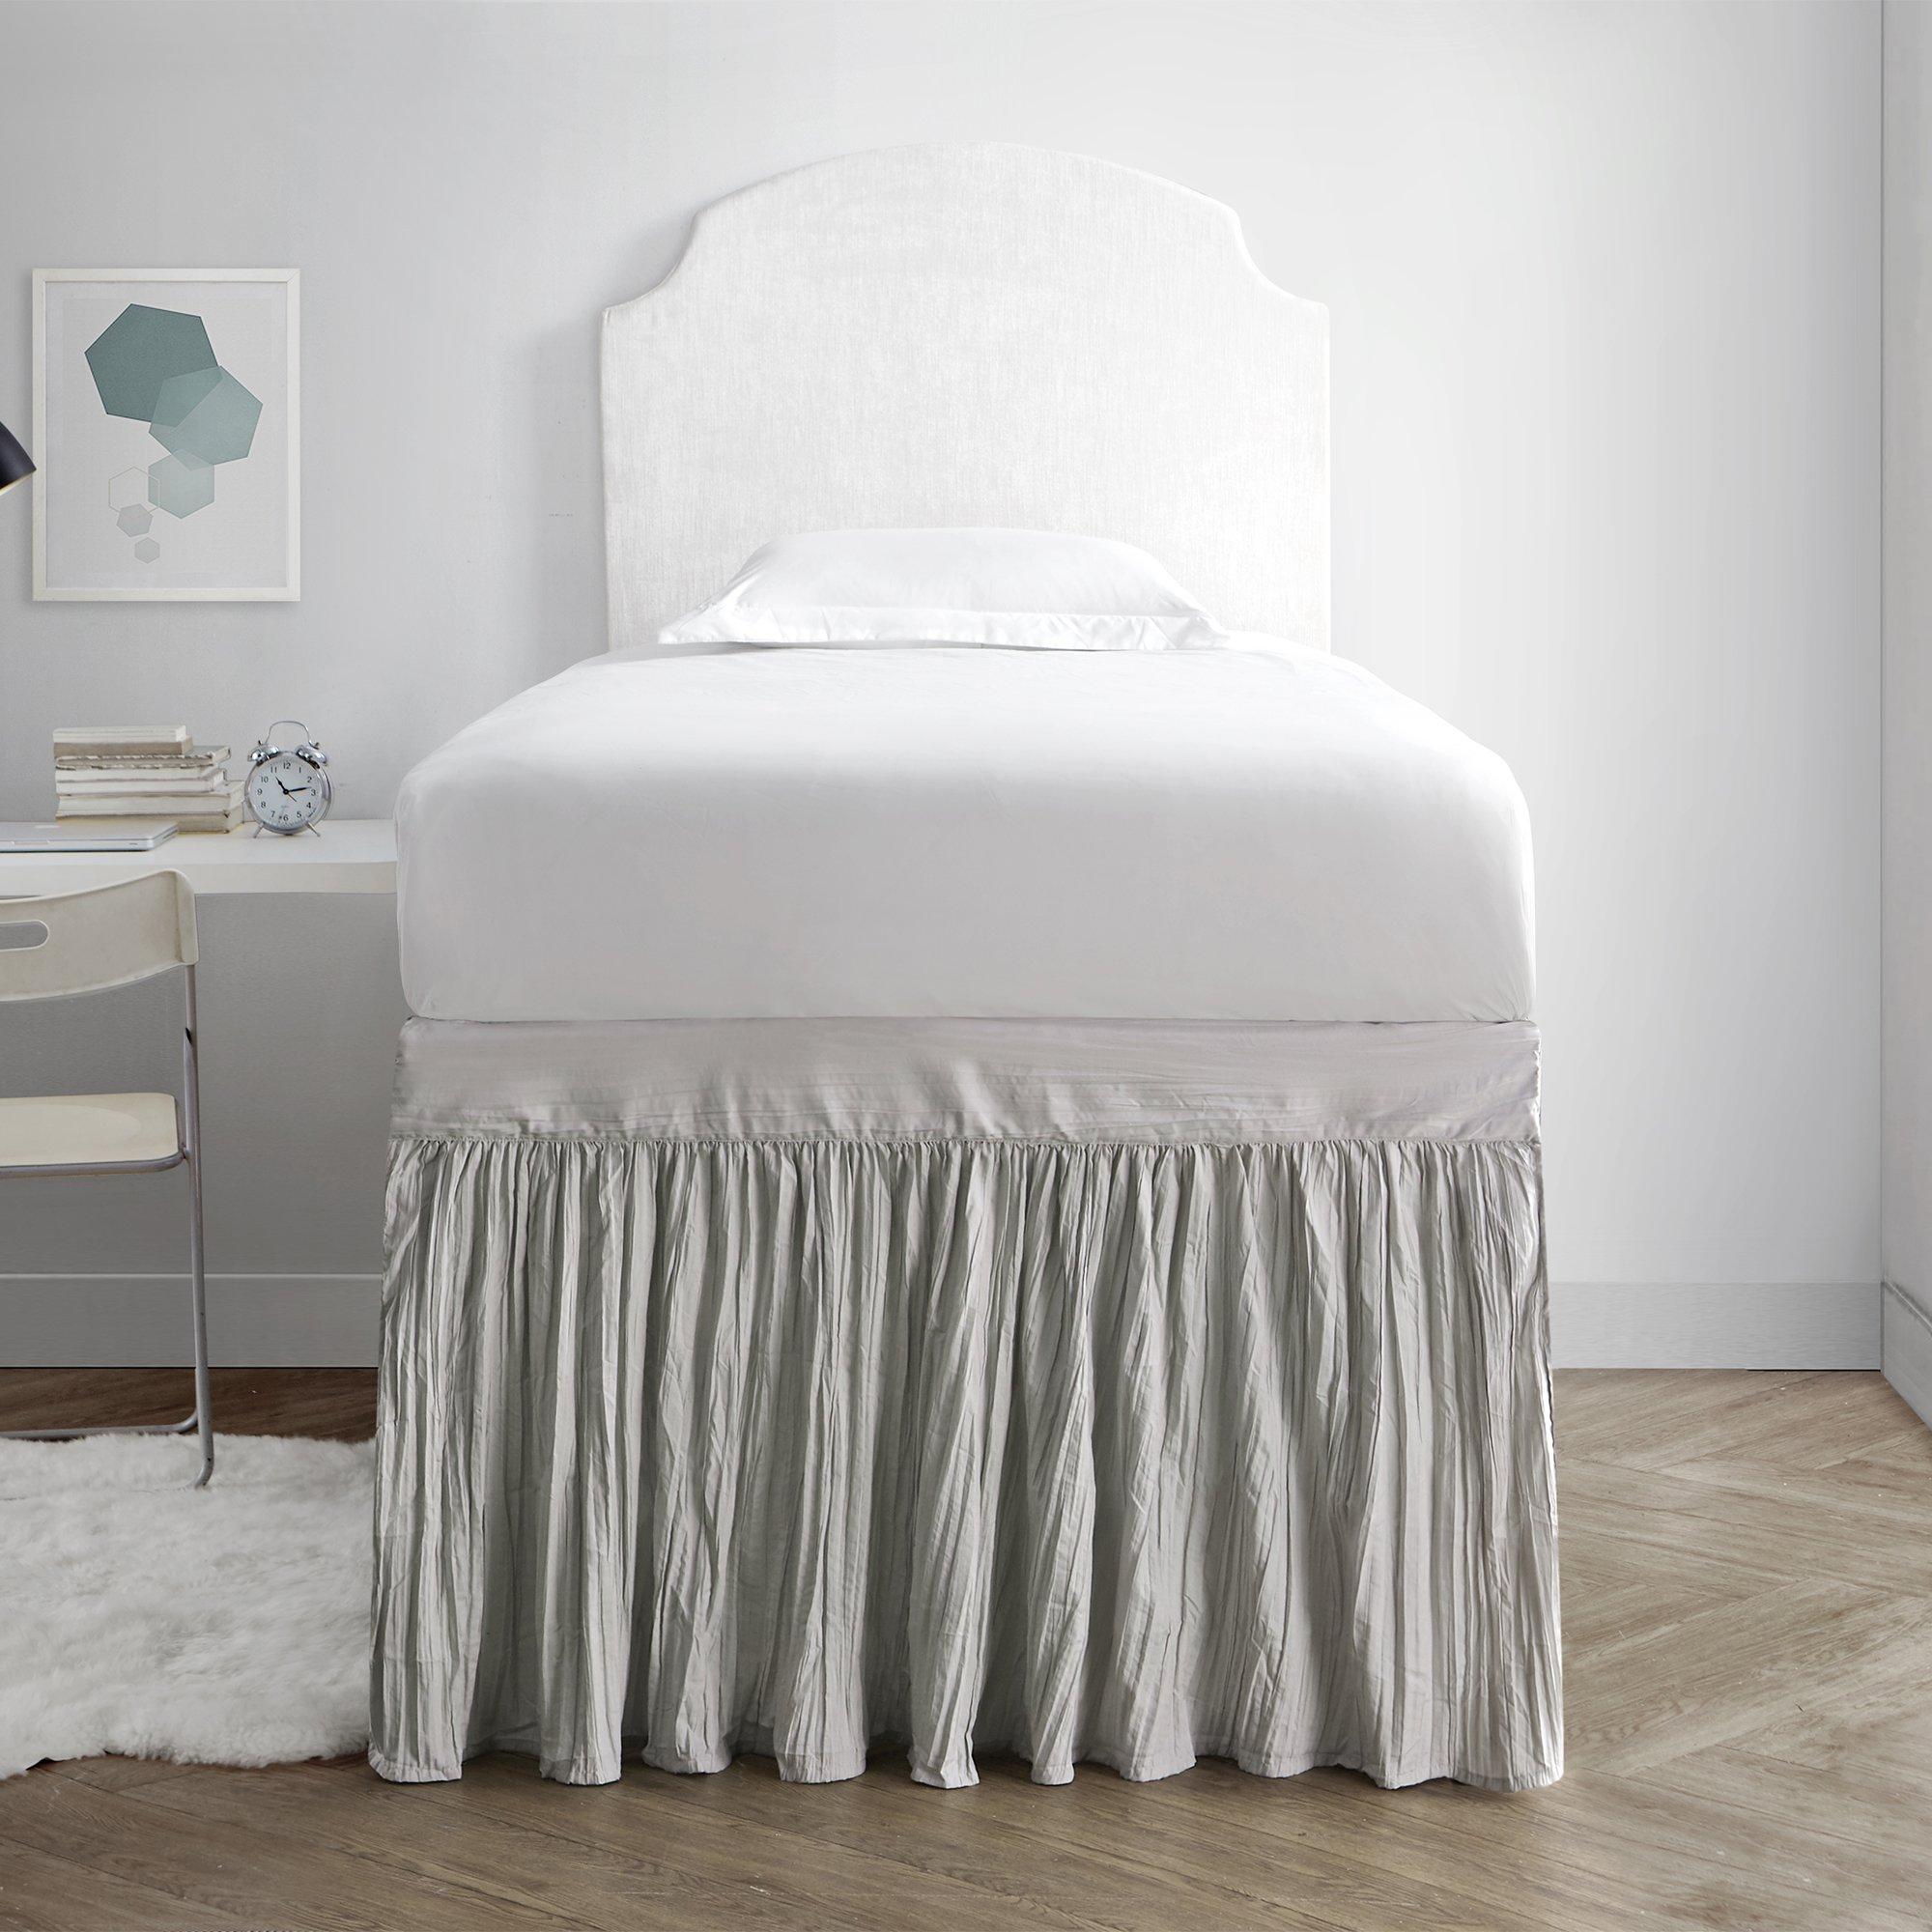 DormCo Crinkle Bed Skirt Twin XL (3 Panel Set) - Silver Birch